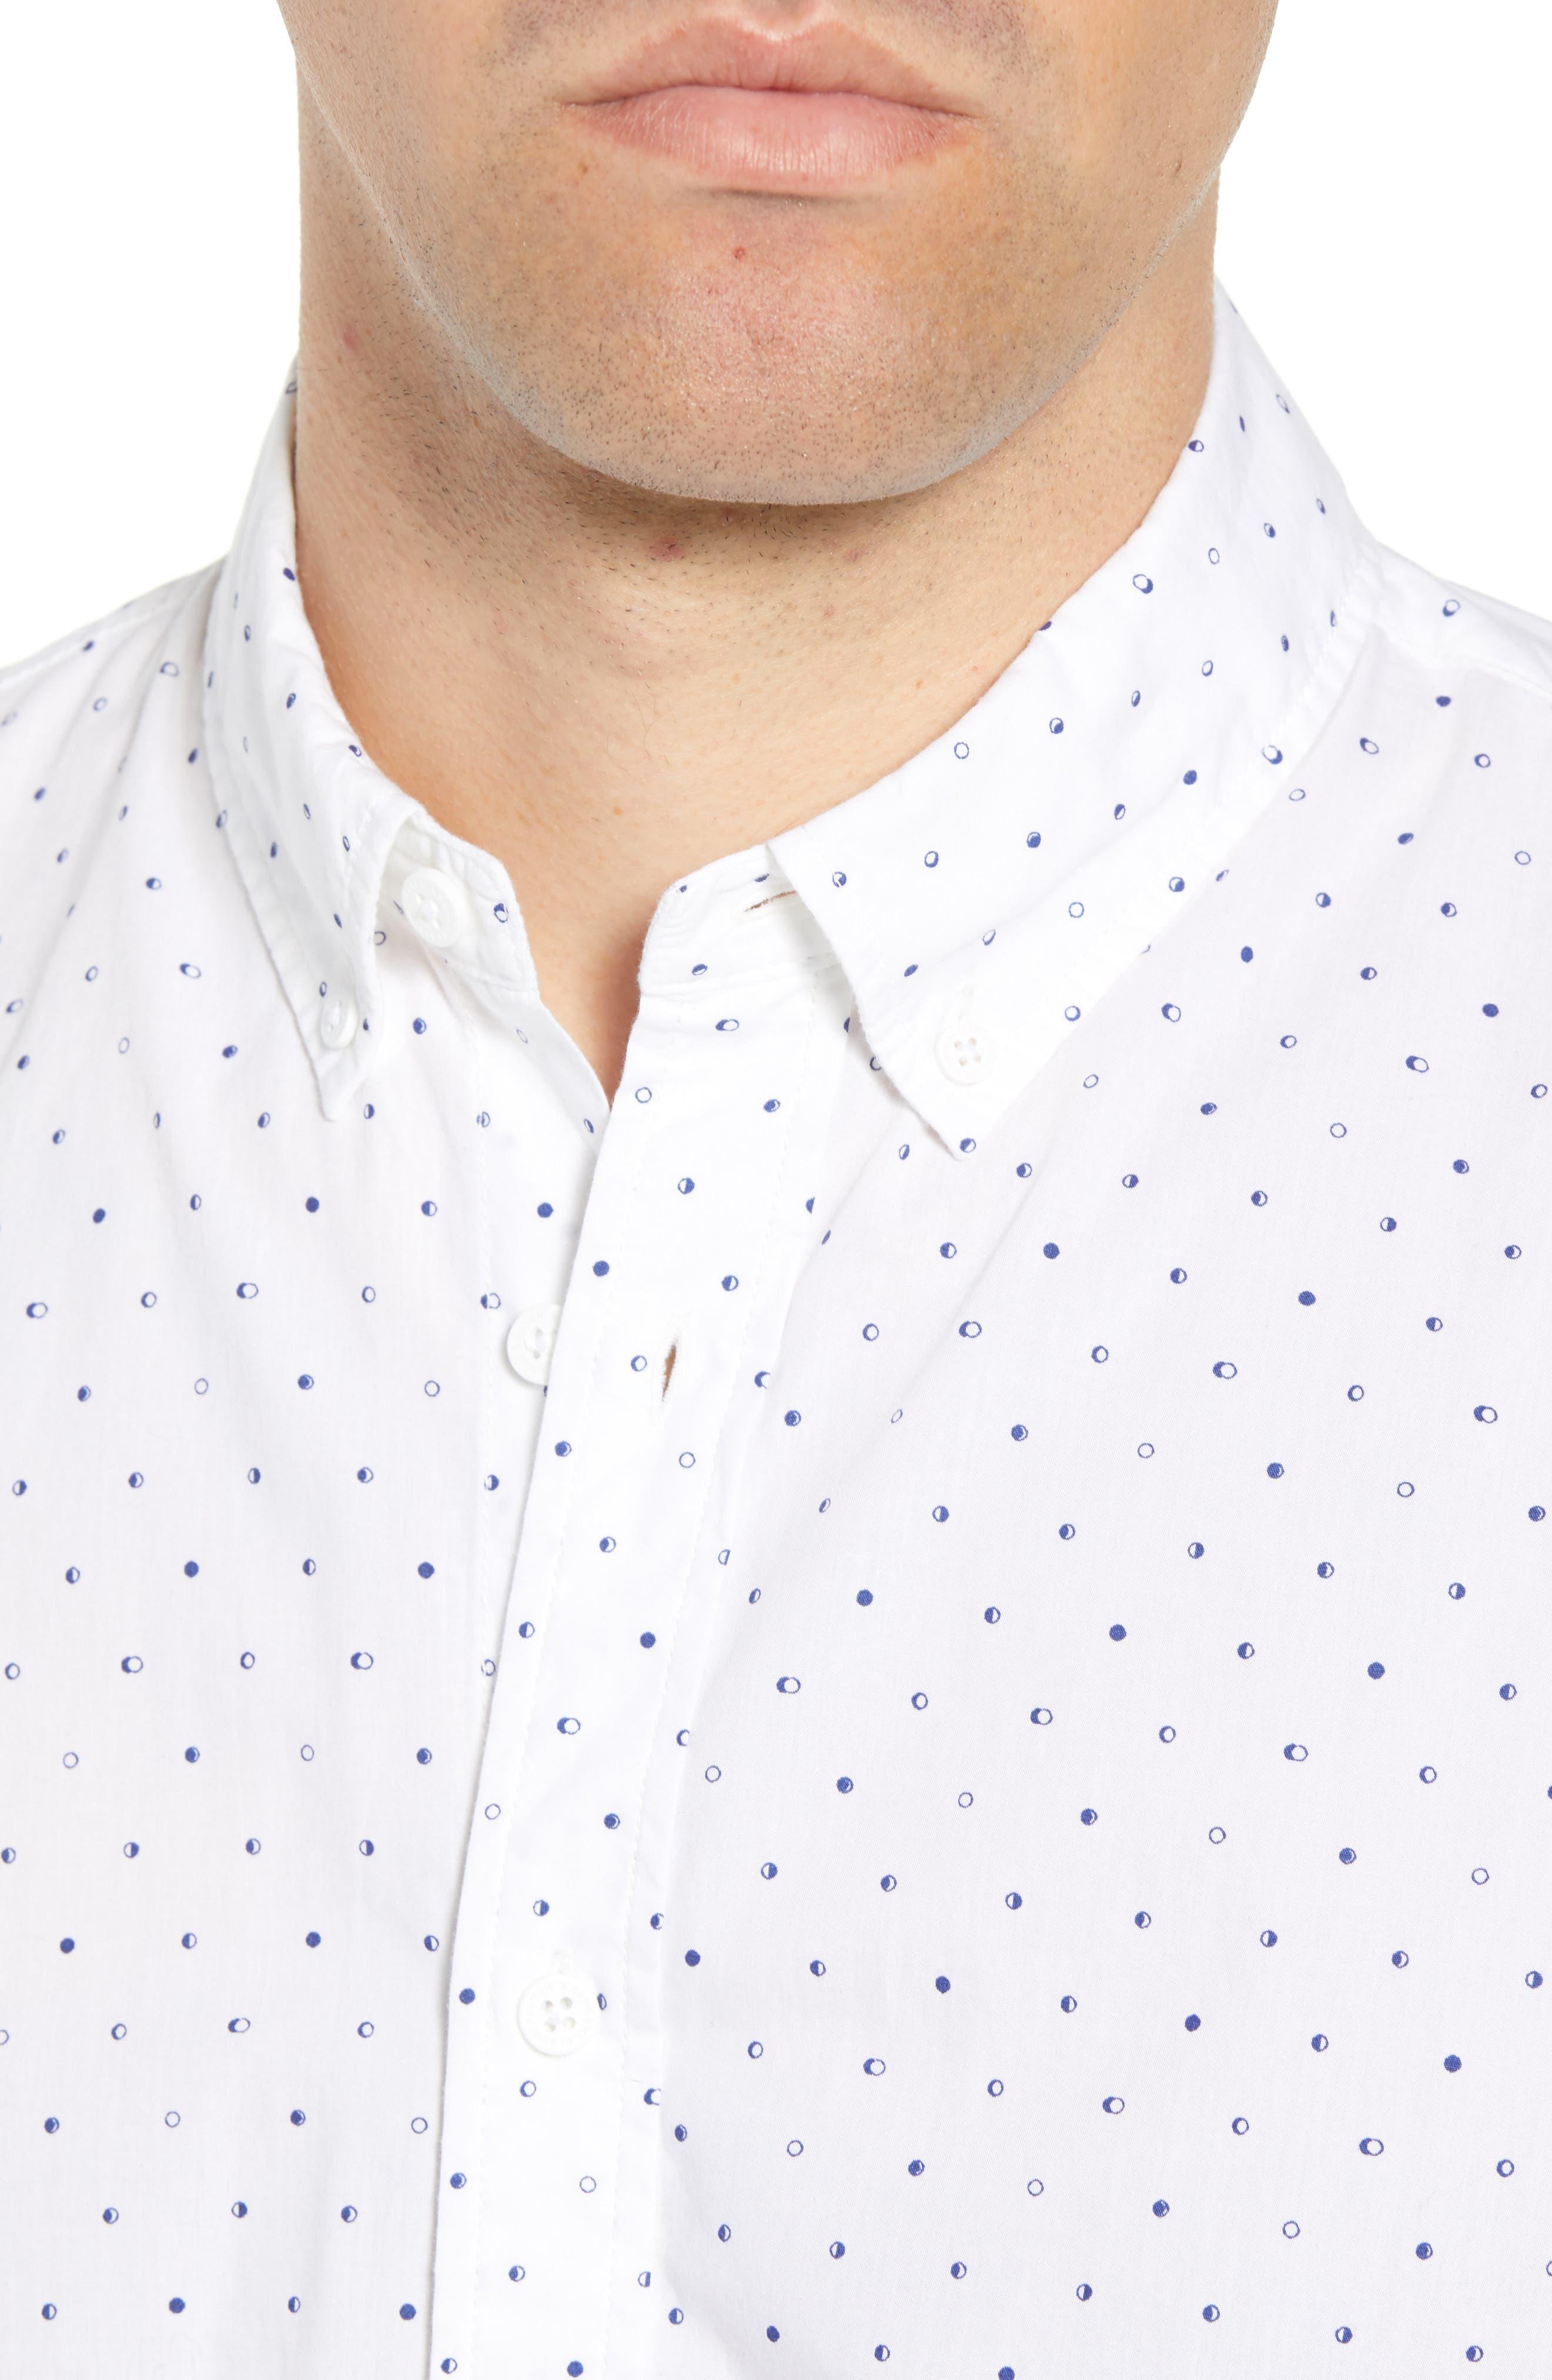 Amsterdams Blauw Simple Light Print Sport Shirt,                             Alternate thumbnail 4, color,                             110